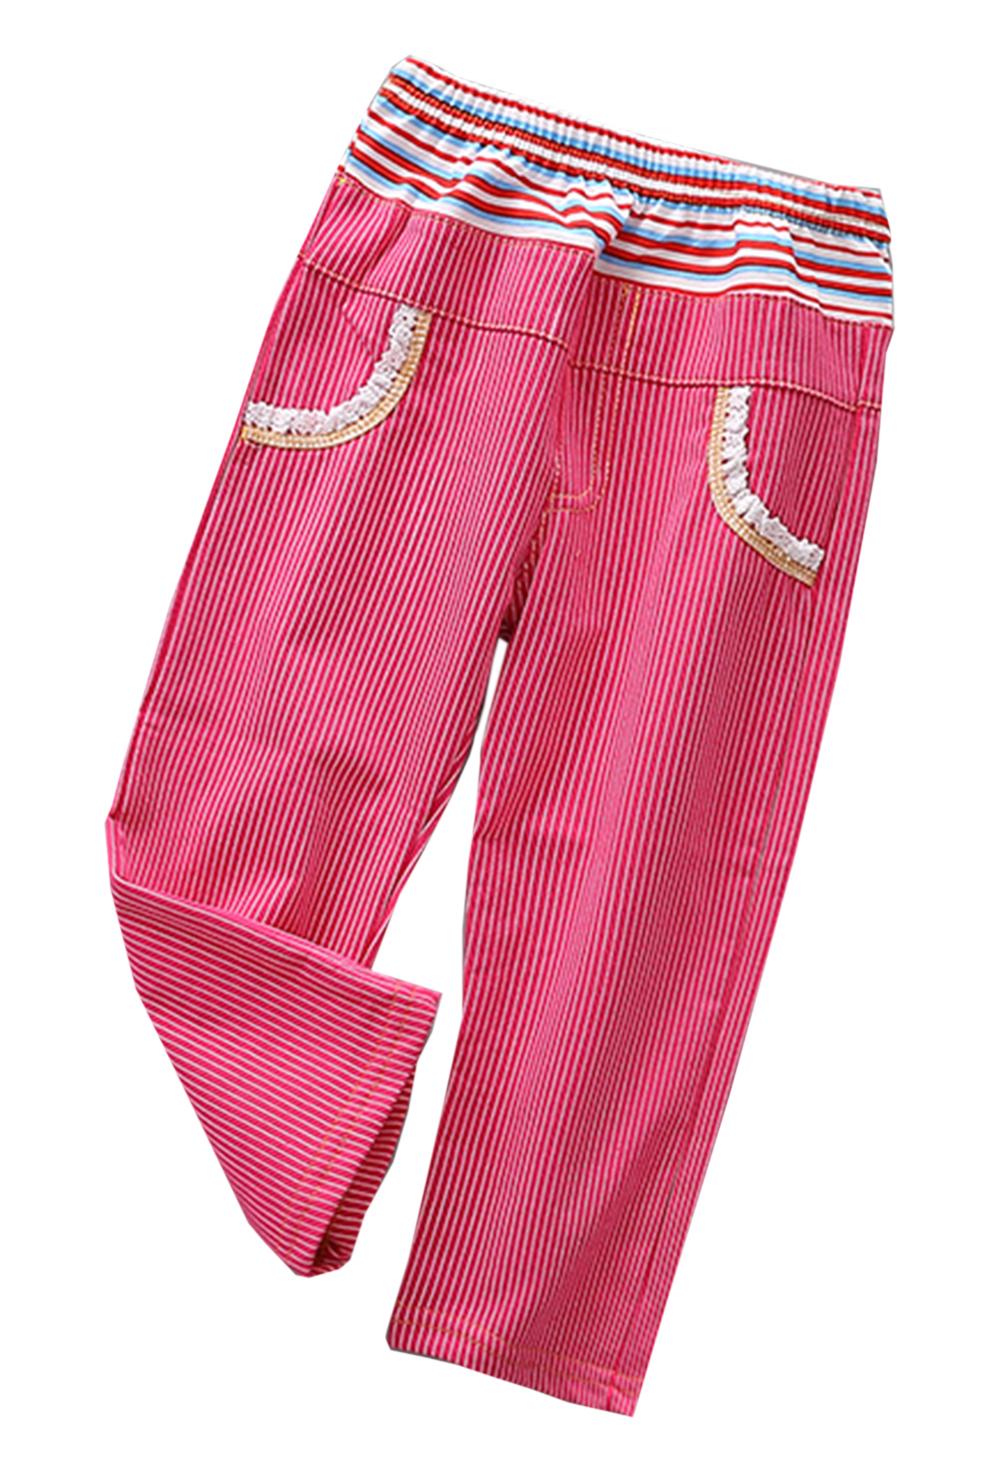 StylesILove Little Girl Long Stripe Elastic Waist Casual Pants - 4 Colors (120/5-6 Years, Yellow+Black)